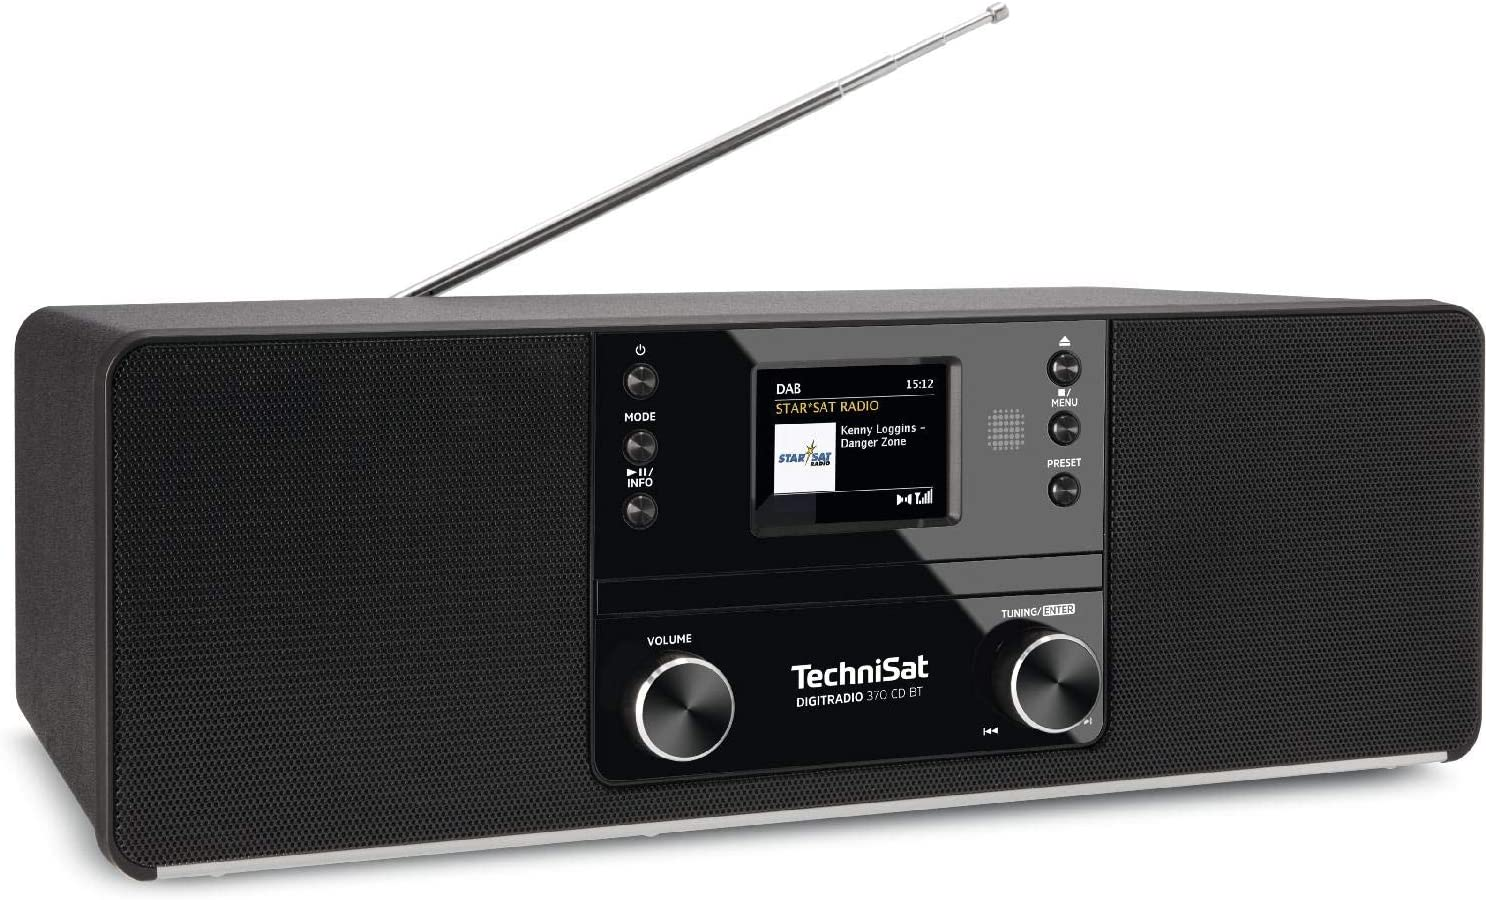 Technisat Digitradio 370 Cd Bt Cd Radio Dab Fm Cd Black Home Cinema Tv Video